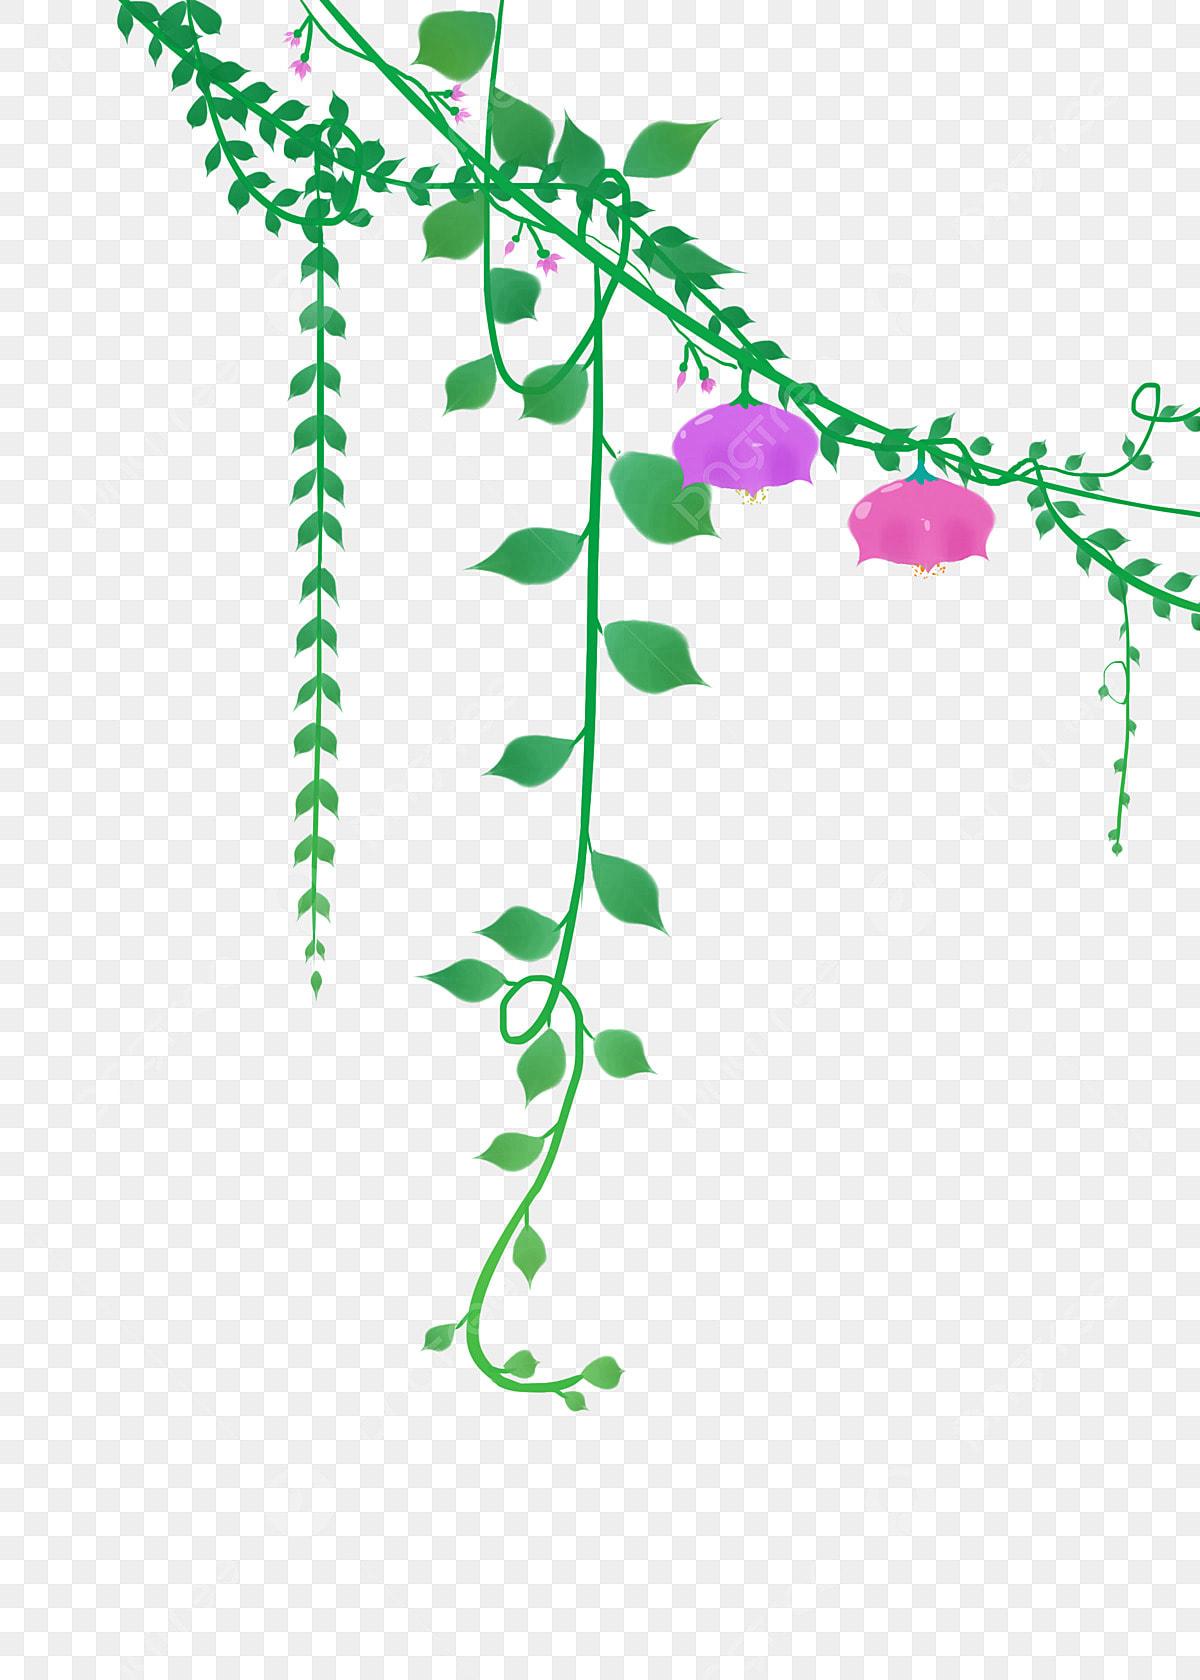 Vides Verdes Flores De Dibujos Animados Decoración De